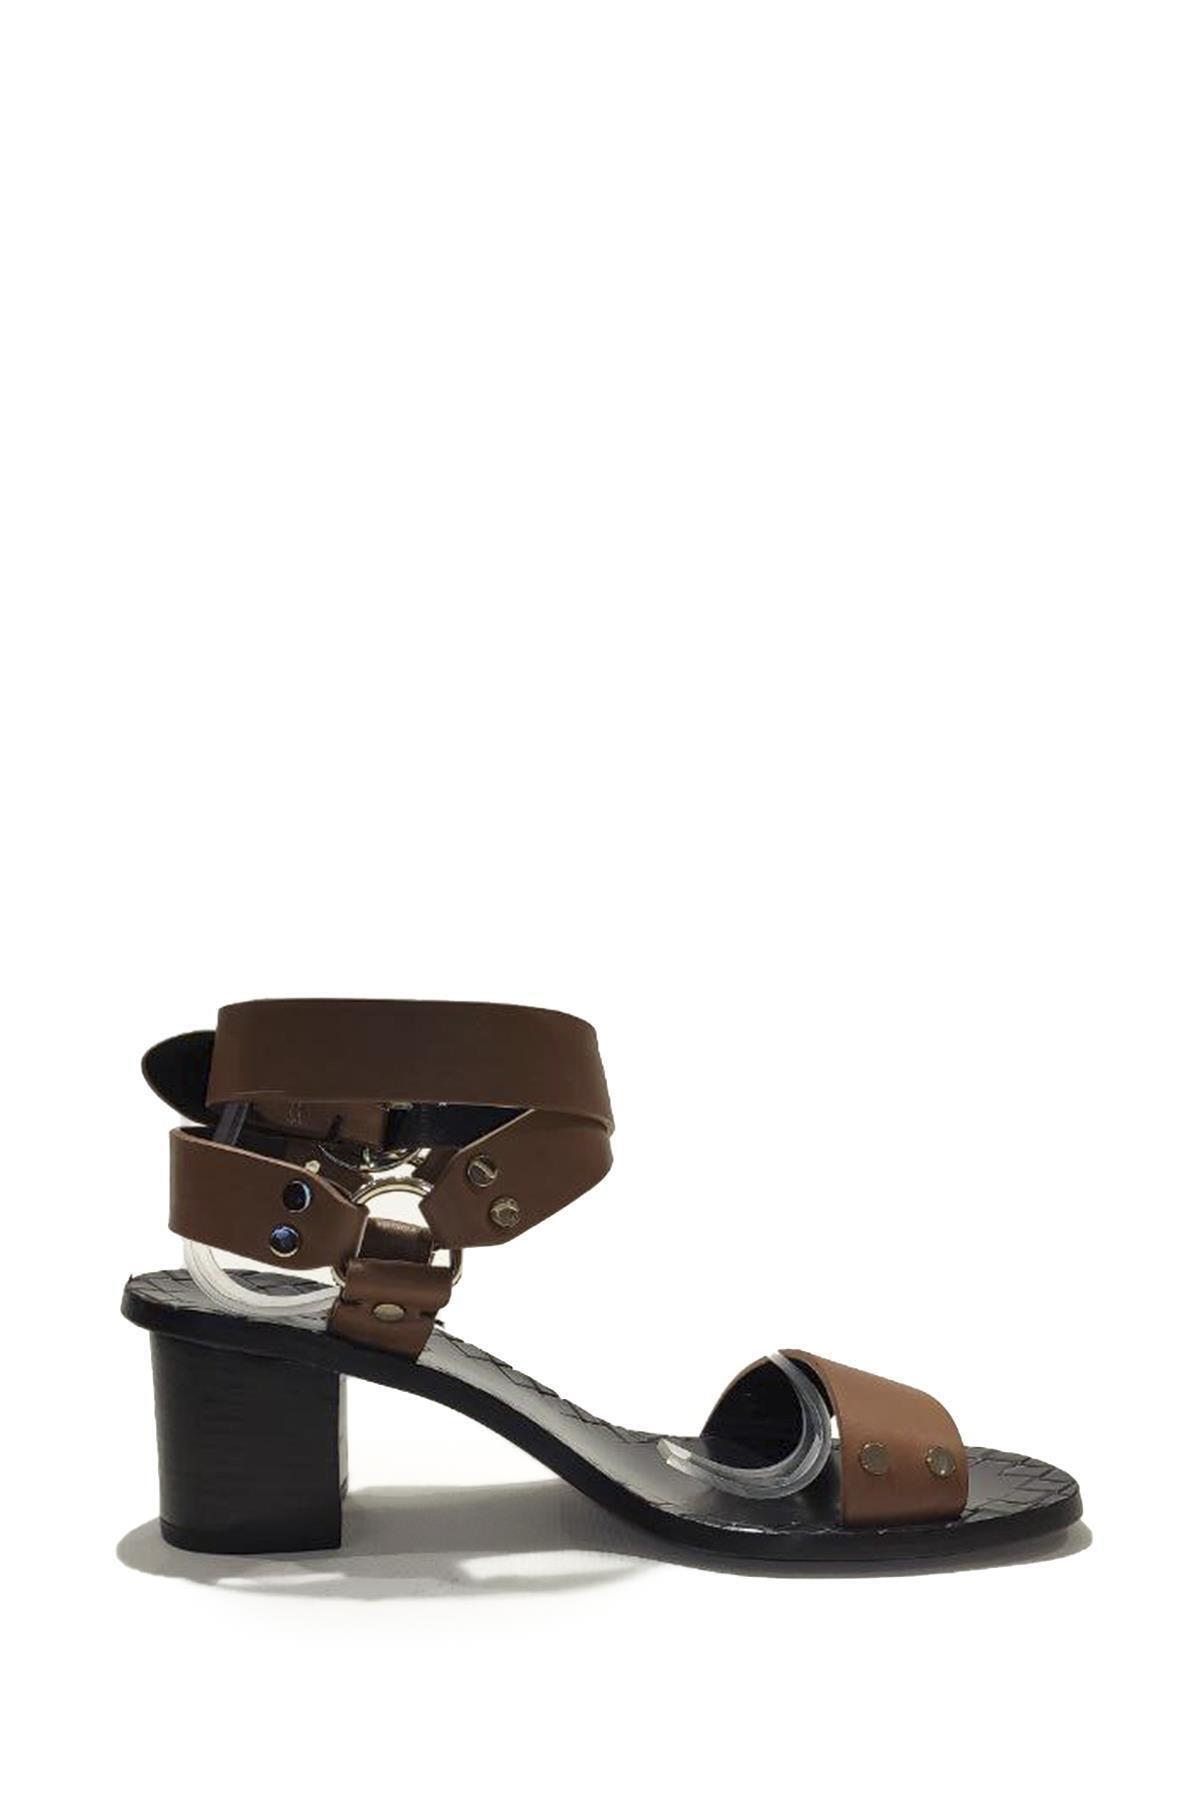 Nursace Hakiki Deri Klasik Topuklu Ayakkabı Nsc19y-a57506 Quetto 2